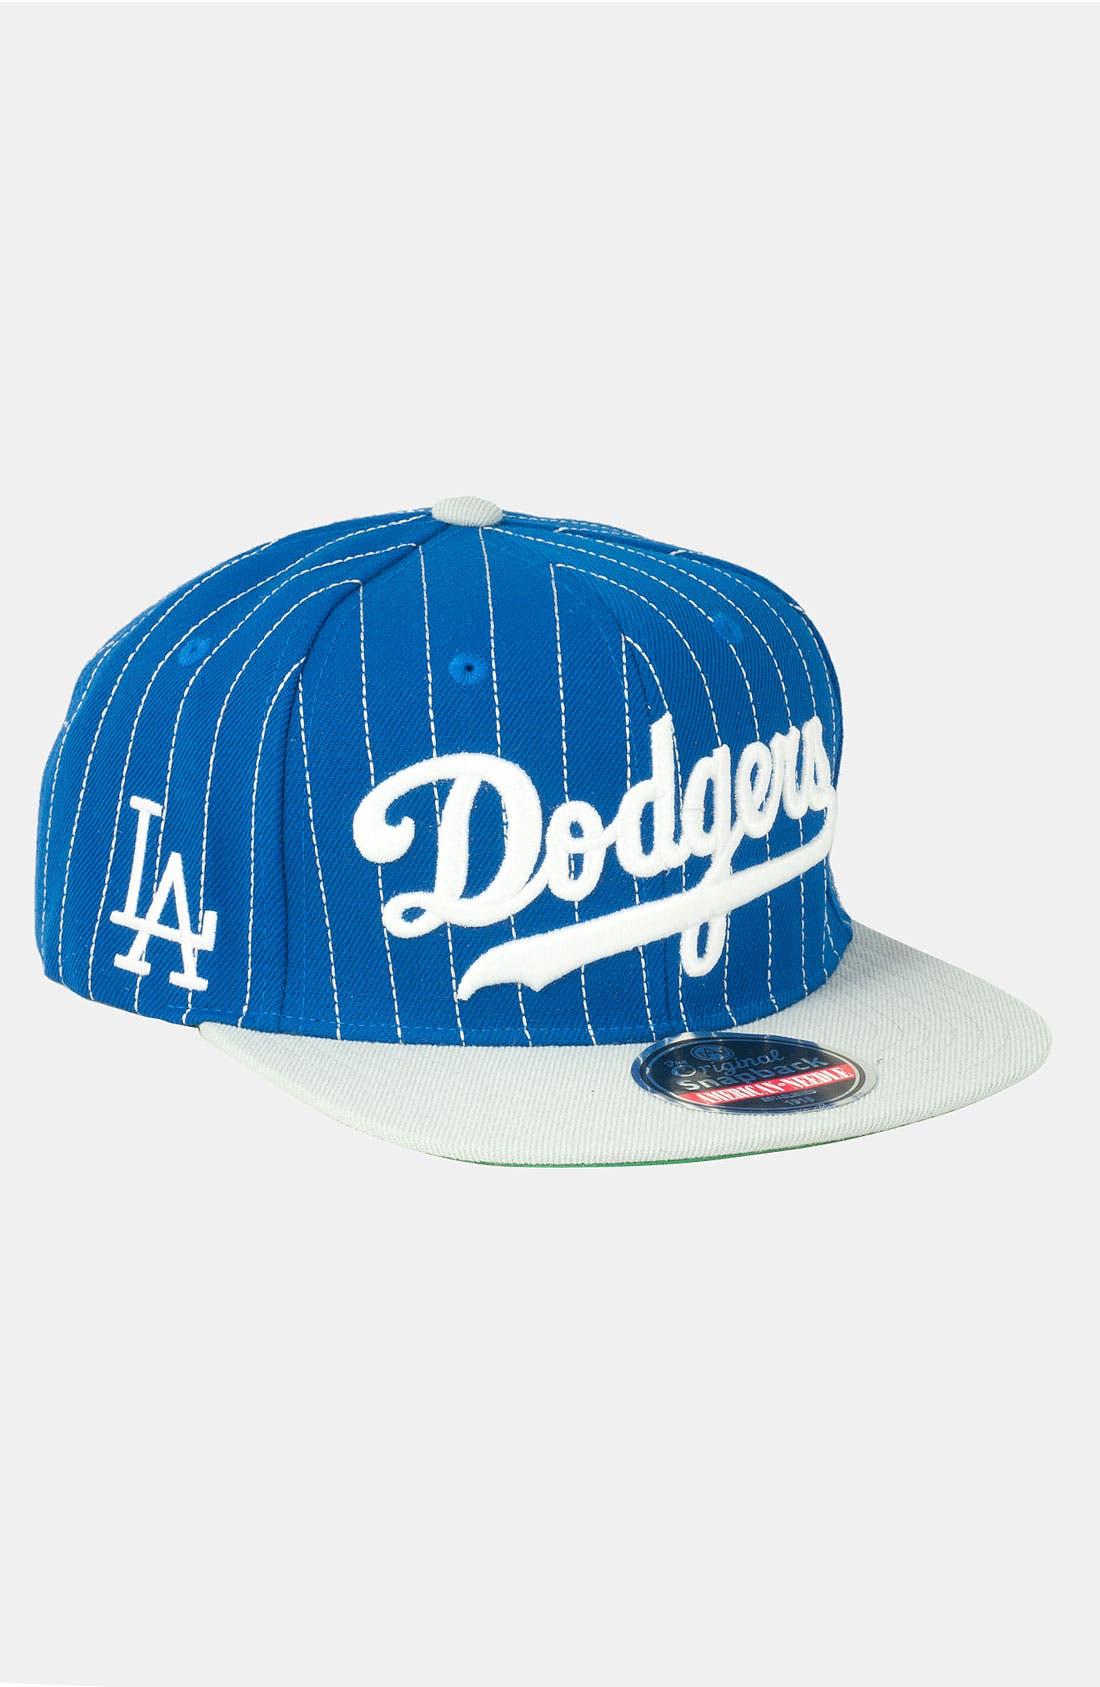 Alternate Image 1 Selected - American Needle 'Dodgers' Snapback Baseball Cap